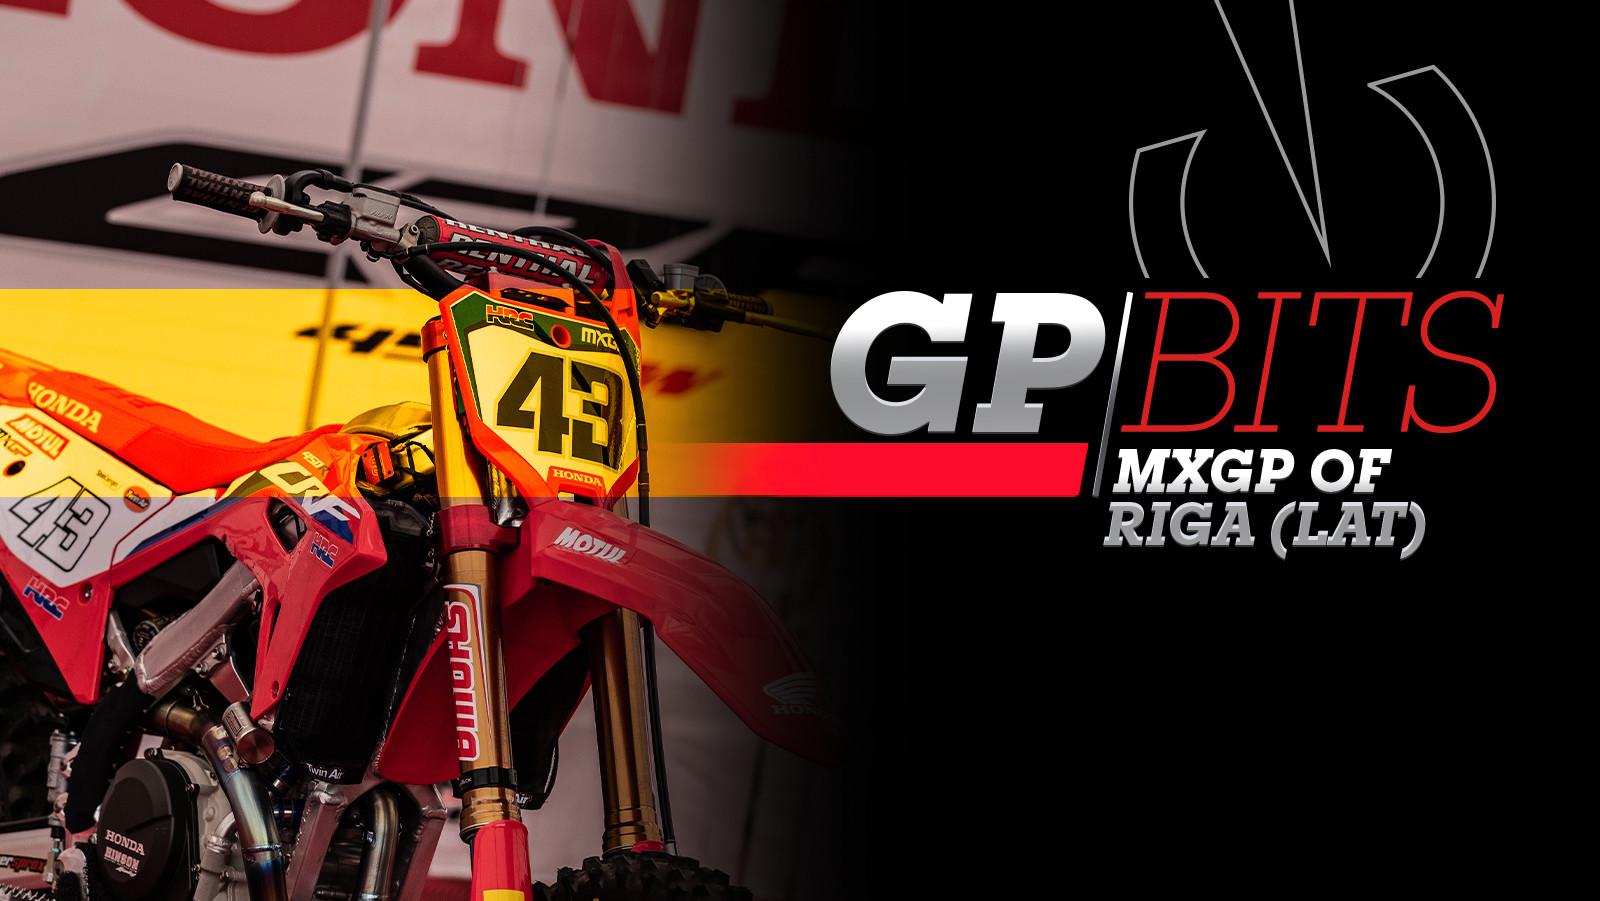 GP Bits: MXGP of Riga | Round 4